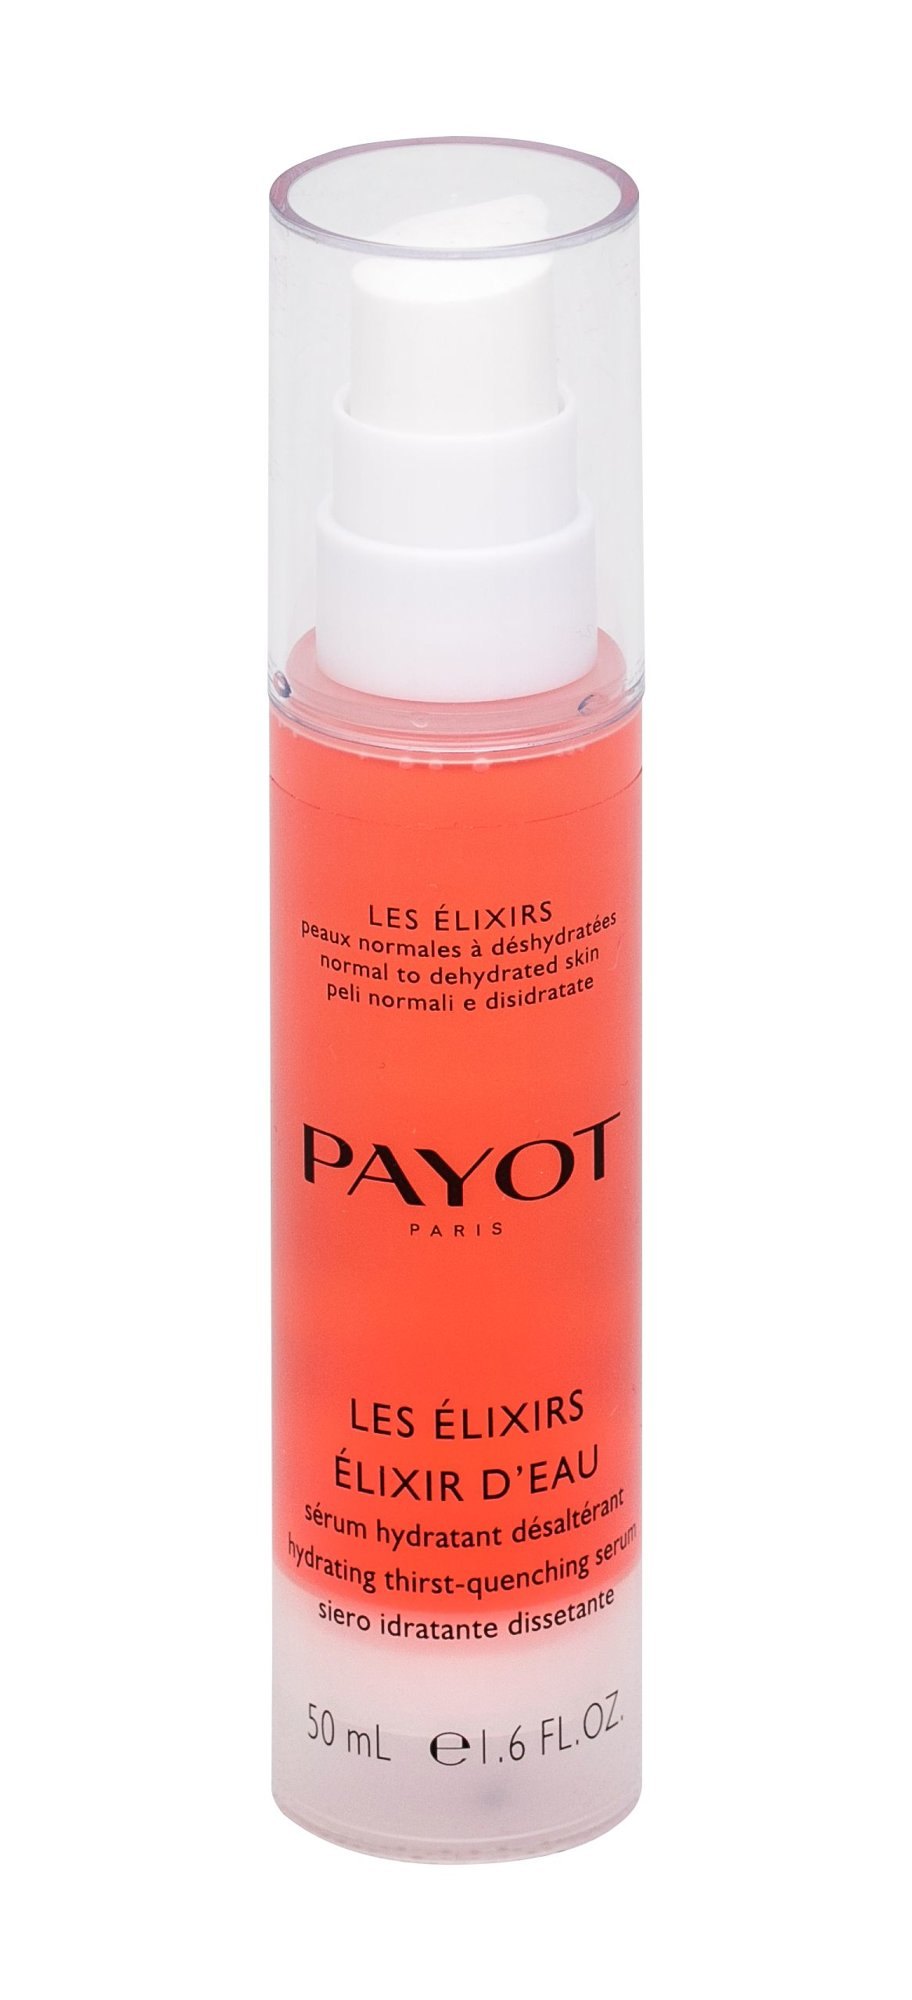 PAYOT Les Elixirs Skin Serum 50ml